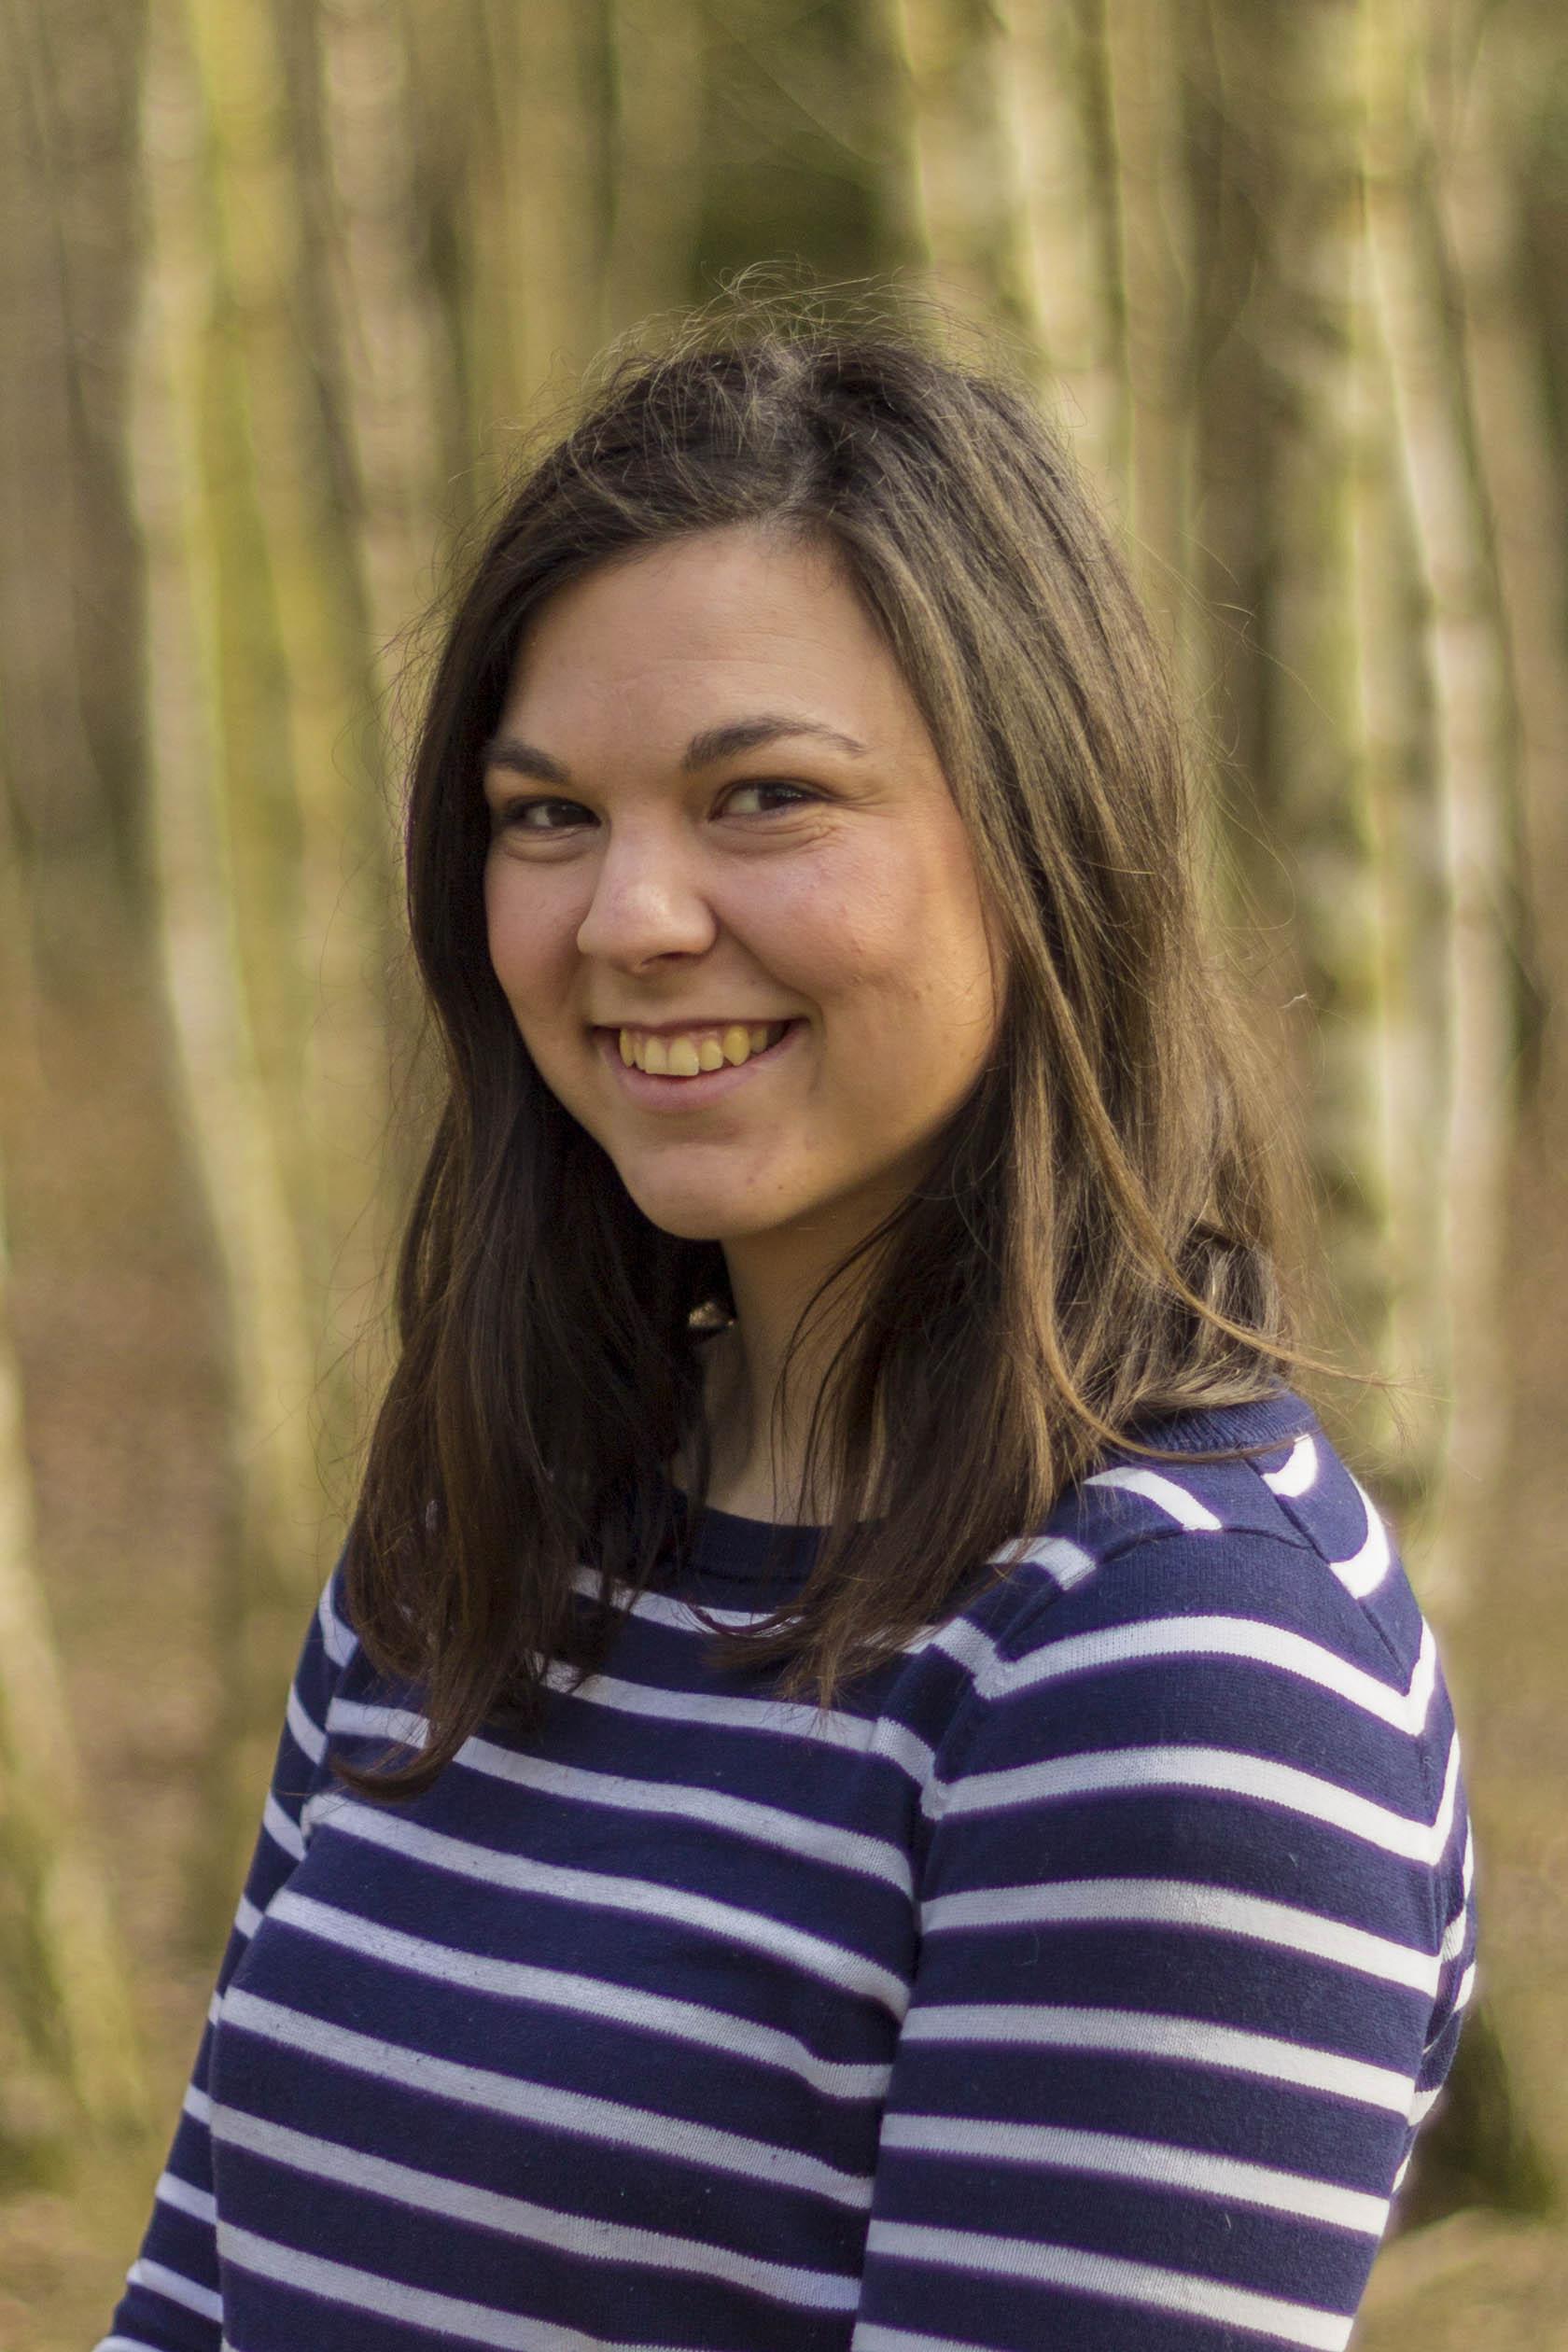 Samantha Chilcott